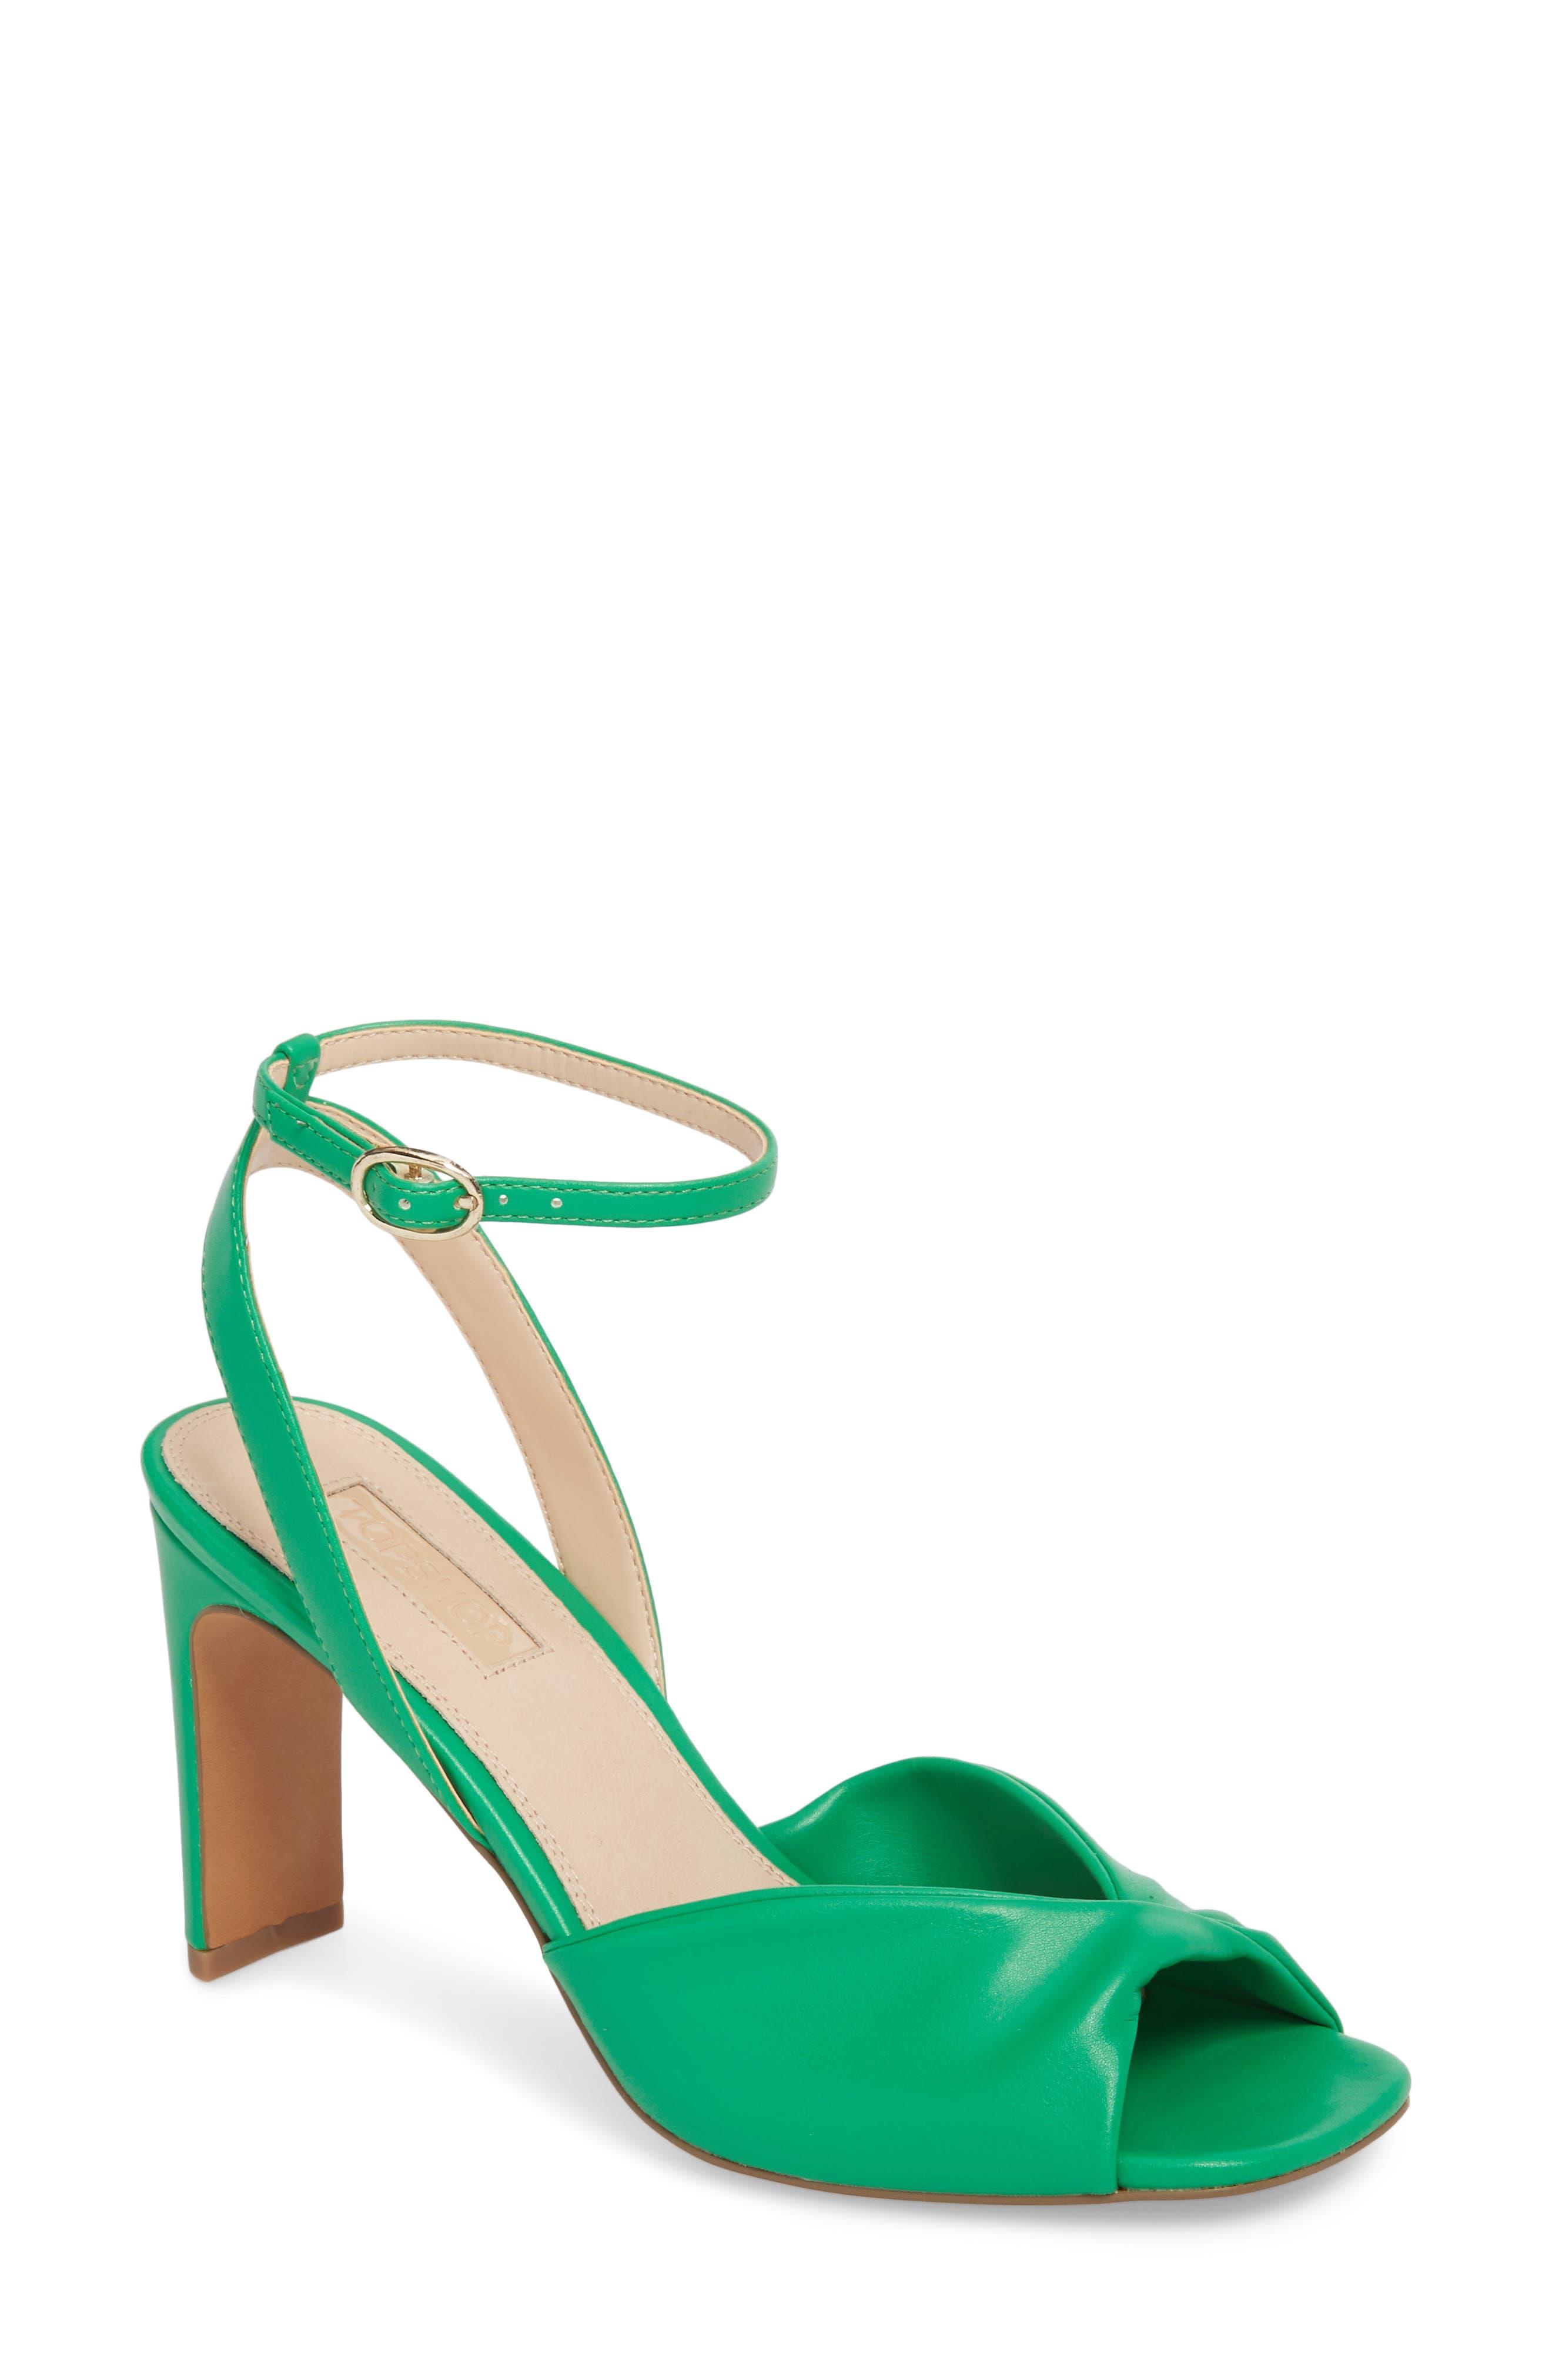 Raven Skinny Heel Sandal,                         Main,                         color, Green